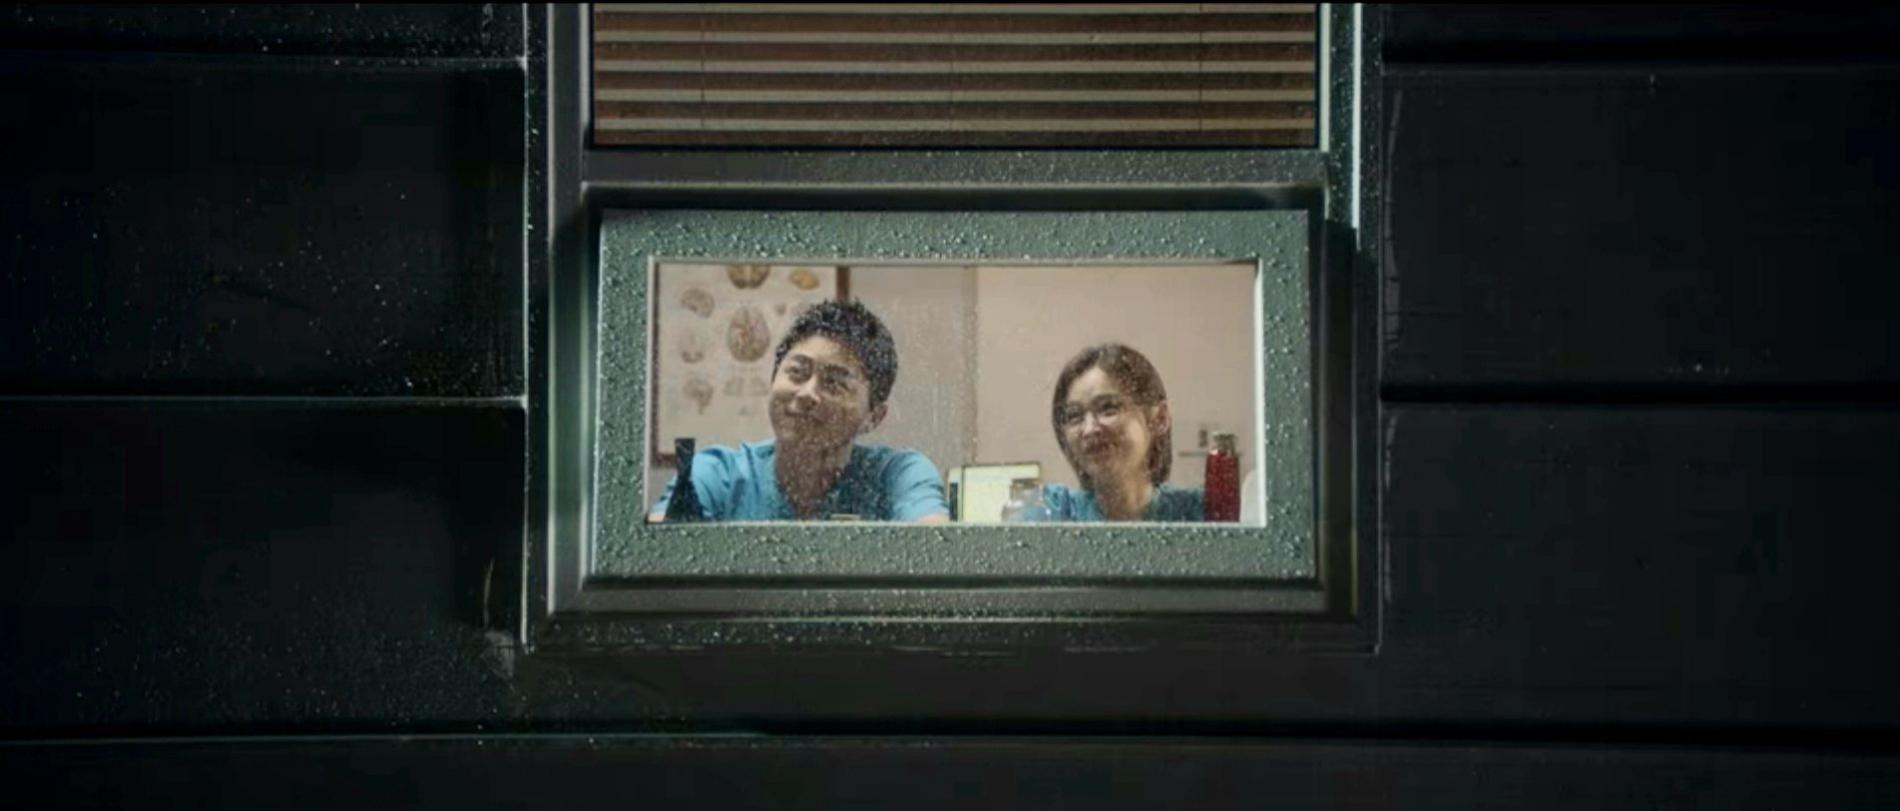 Drama Korea Hospital Playlist 2 Episode 11 Sub Indo, Hadiah Spesial untuk Ik Jun